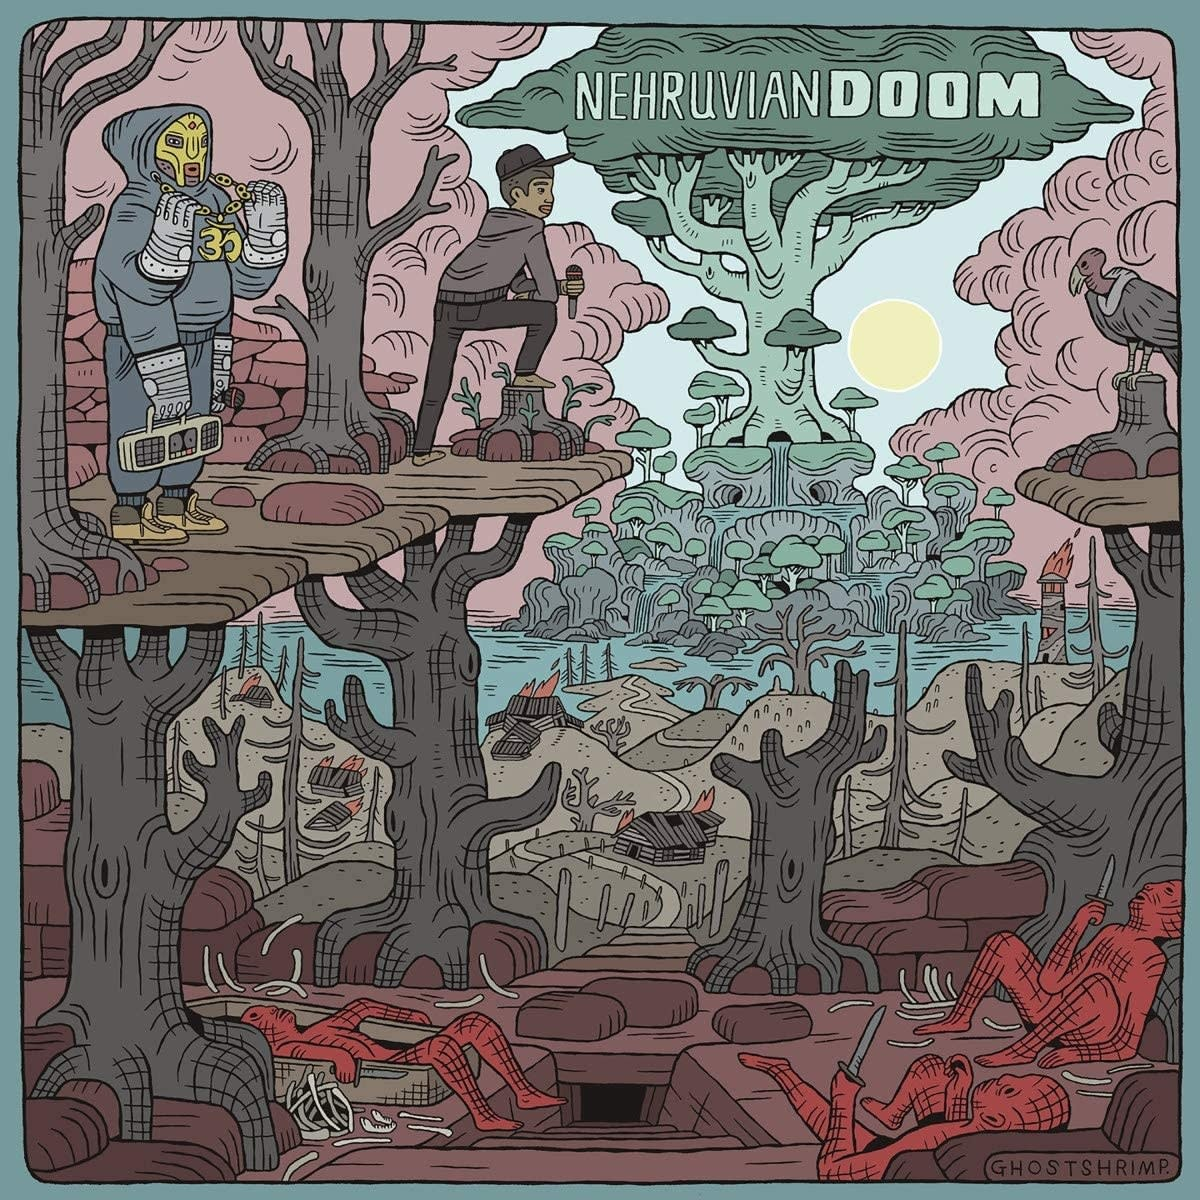 NehruvianDOOM • NehruvianDOOM (Sound Of The Son)-1